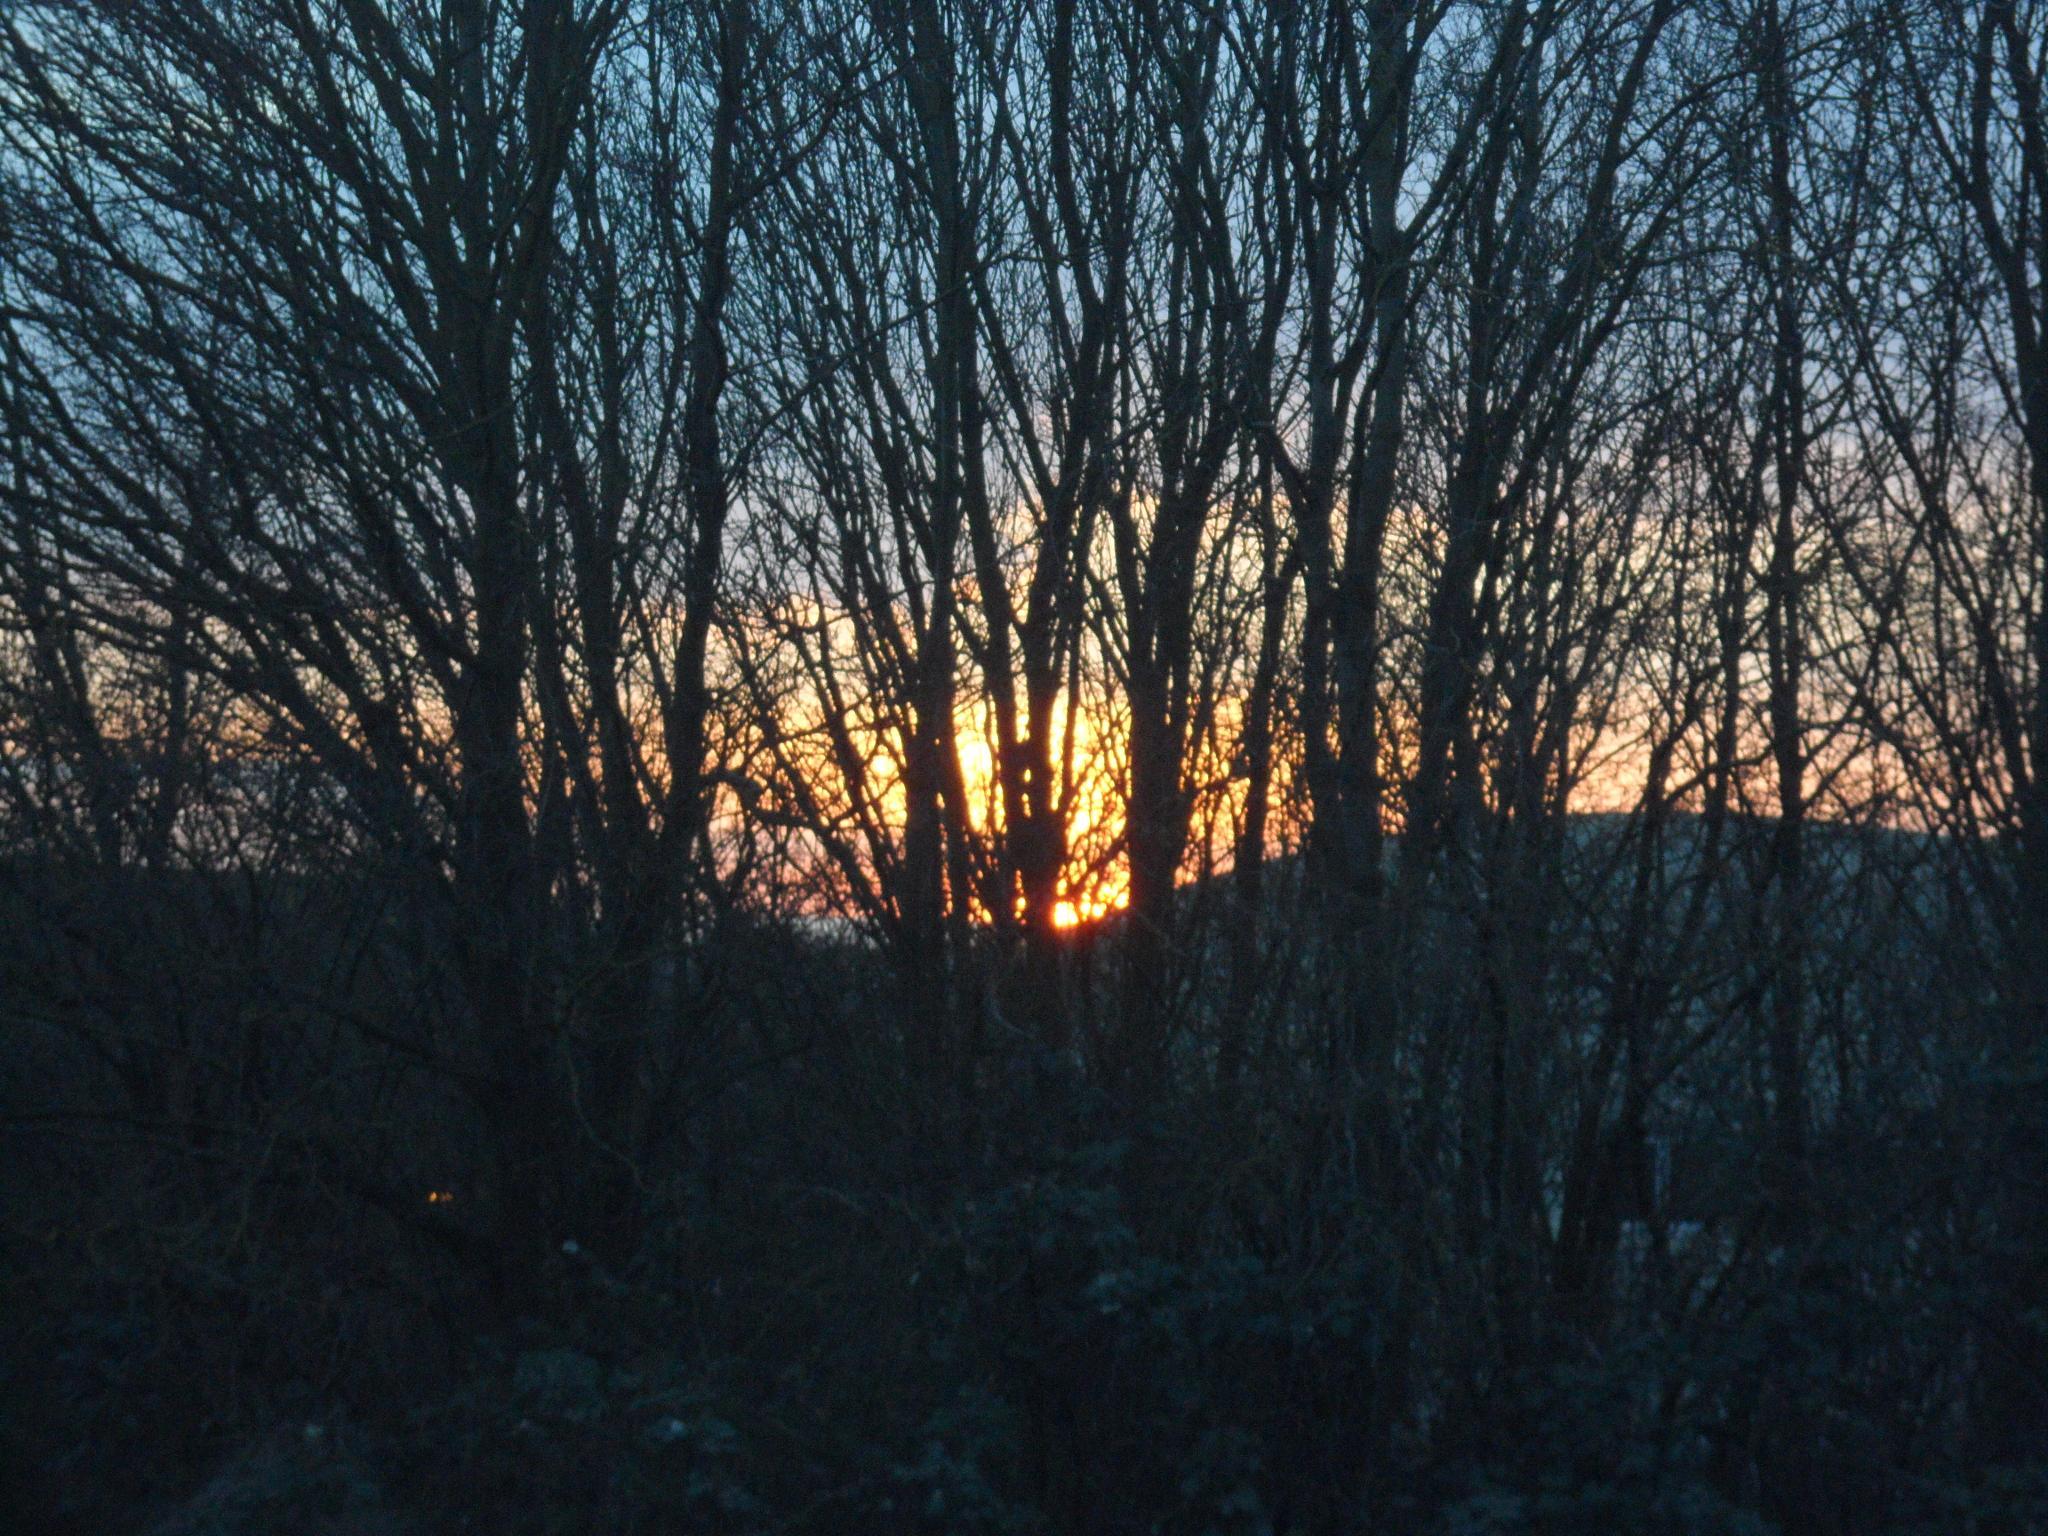 sunsetting by BeverleyForsyth